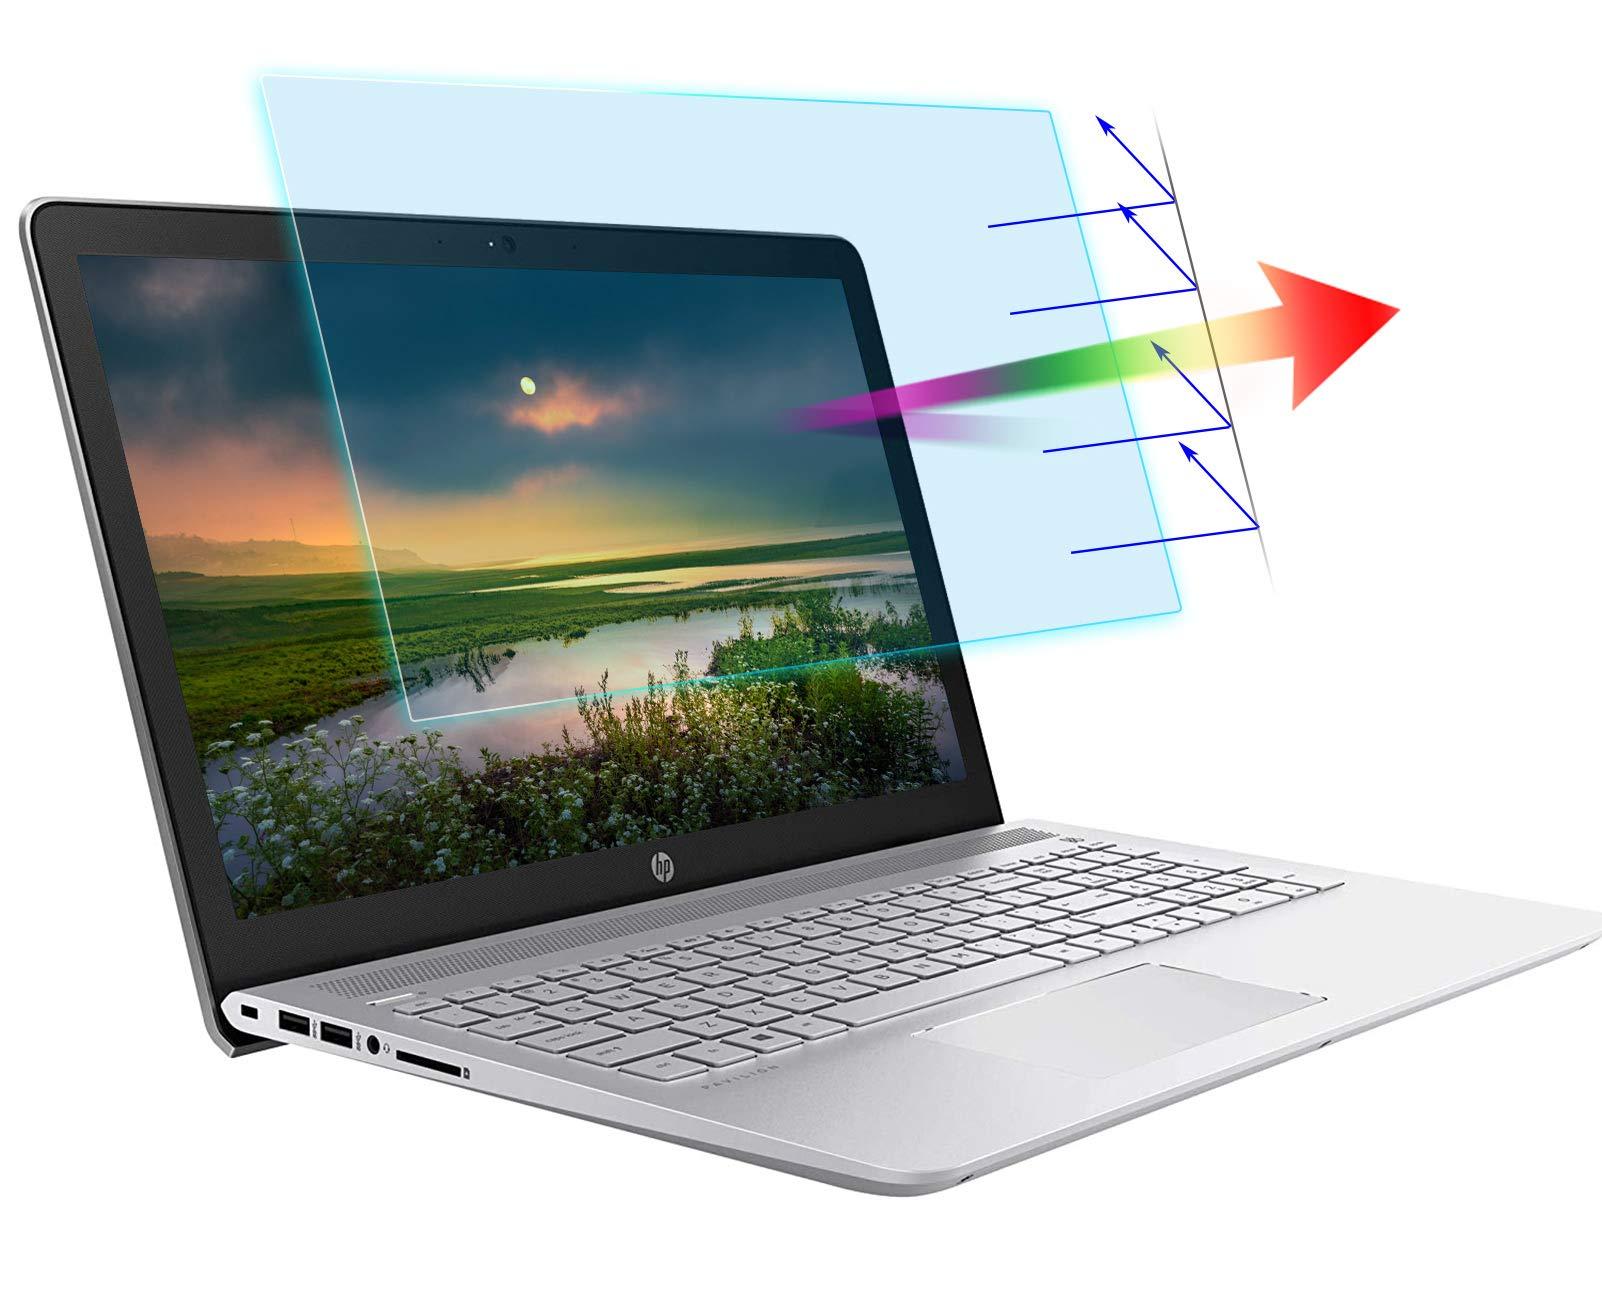 "AntiBlueLight Anti Glare Screen Protector Fit 14 HP Pavilion X360 /HP 14"" Laptop / HP Chromebook 14""/ HP Stream 14 / HP ProBook 14 / HP Stream 14,Eyes Protection Filter Block UV Blue Light Blocking Screen Protector"